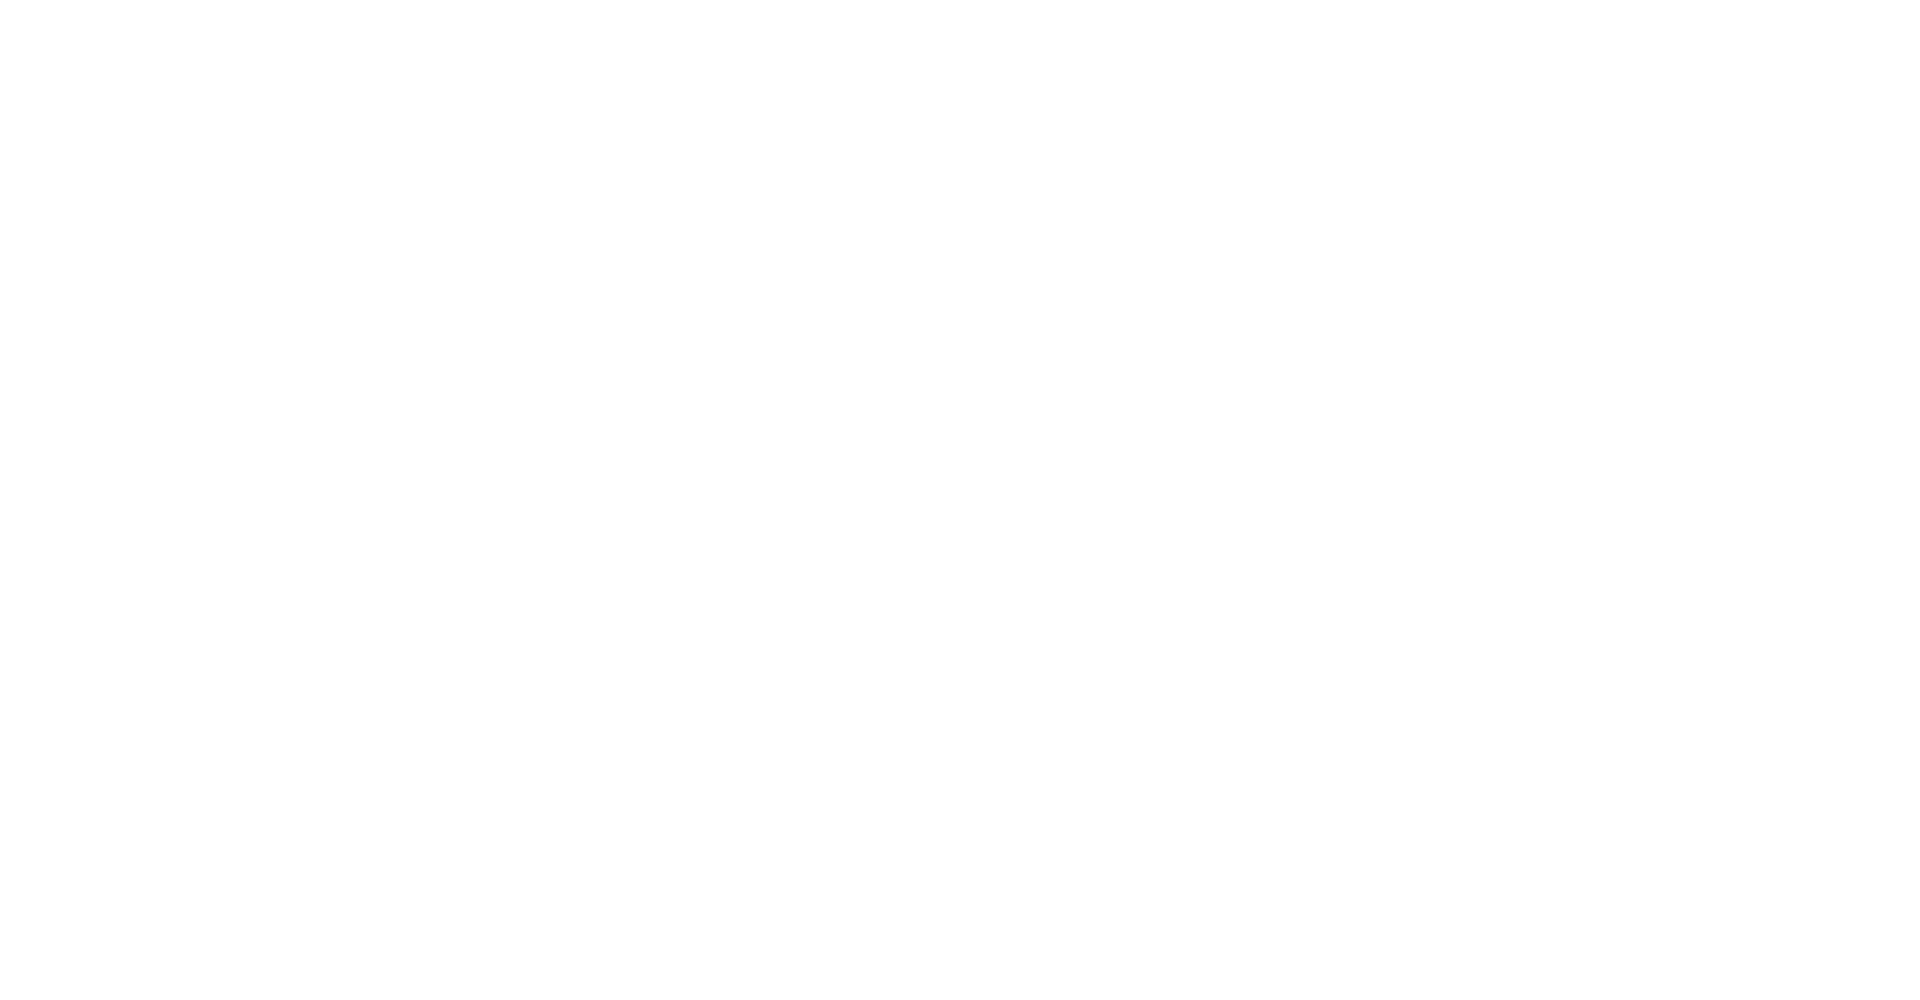 MYFUNDBOX - STRIPE